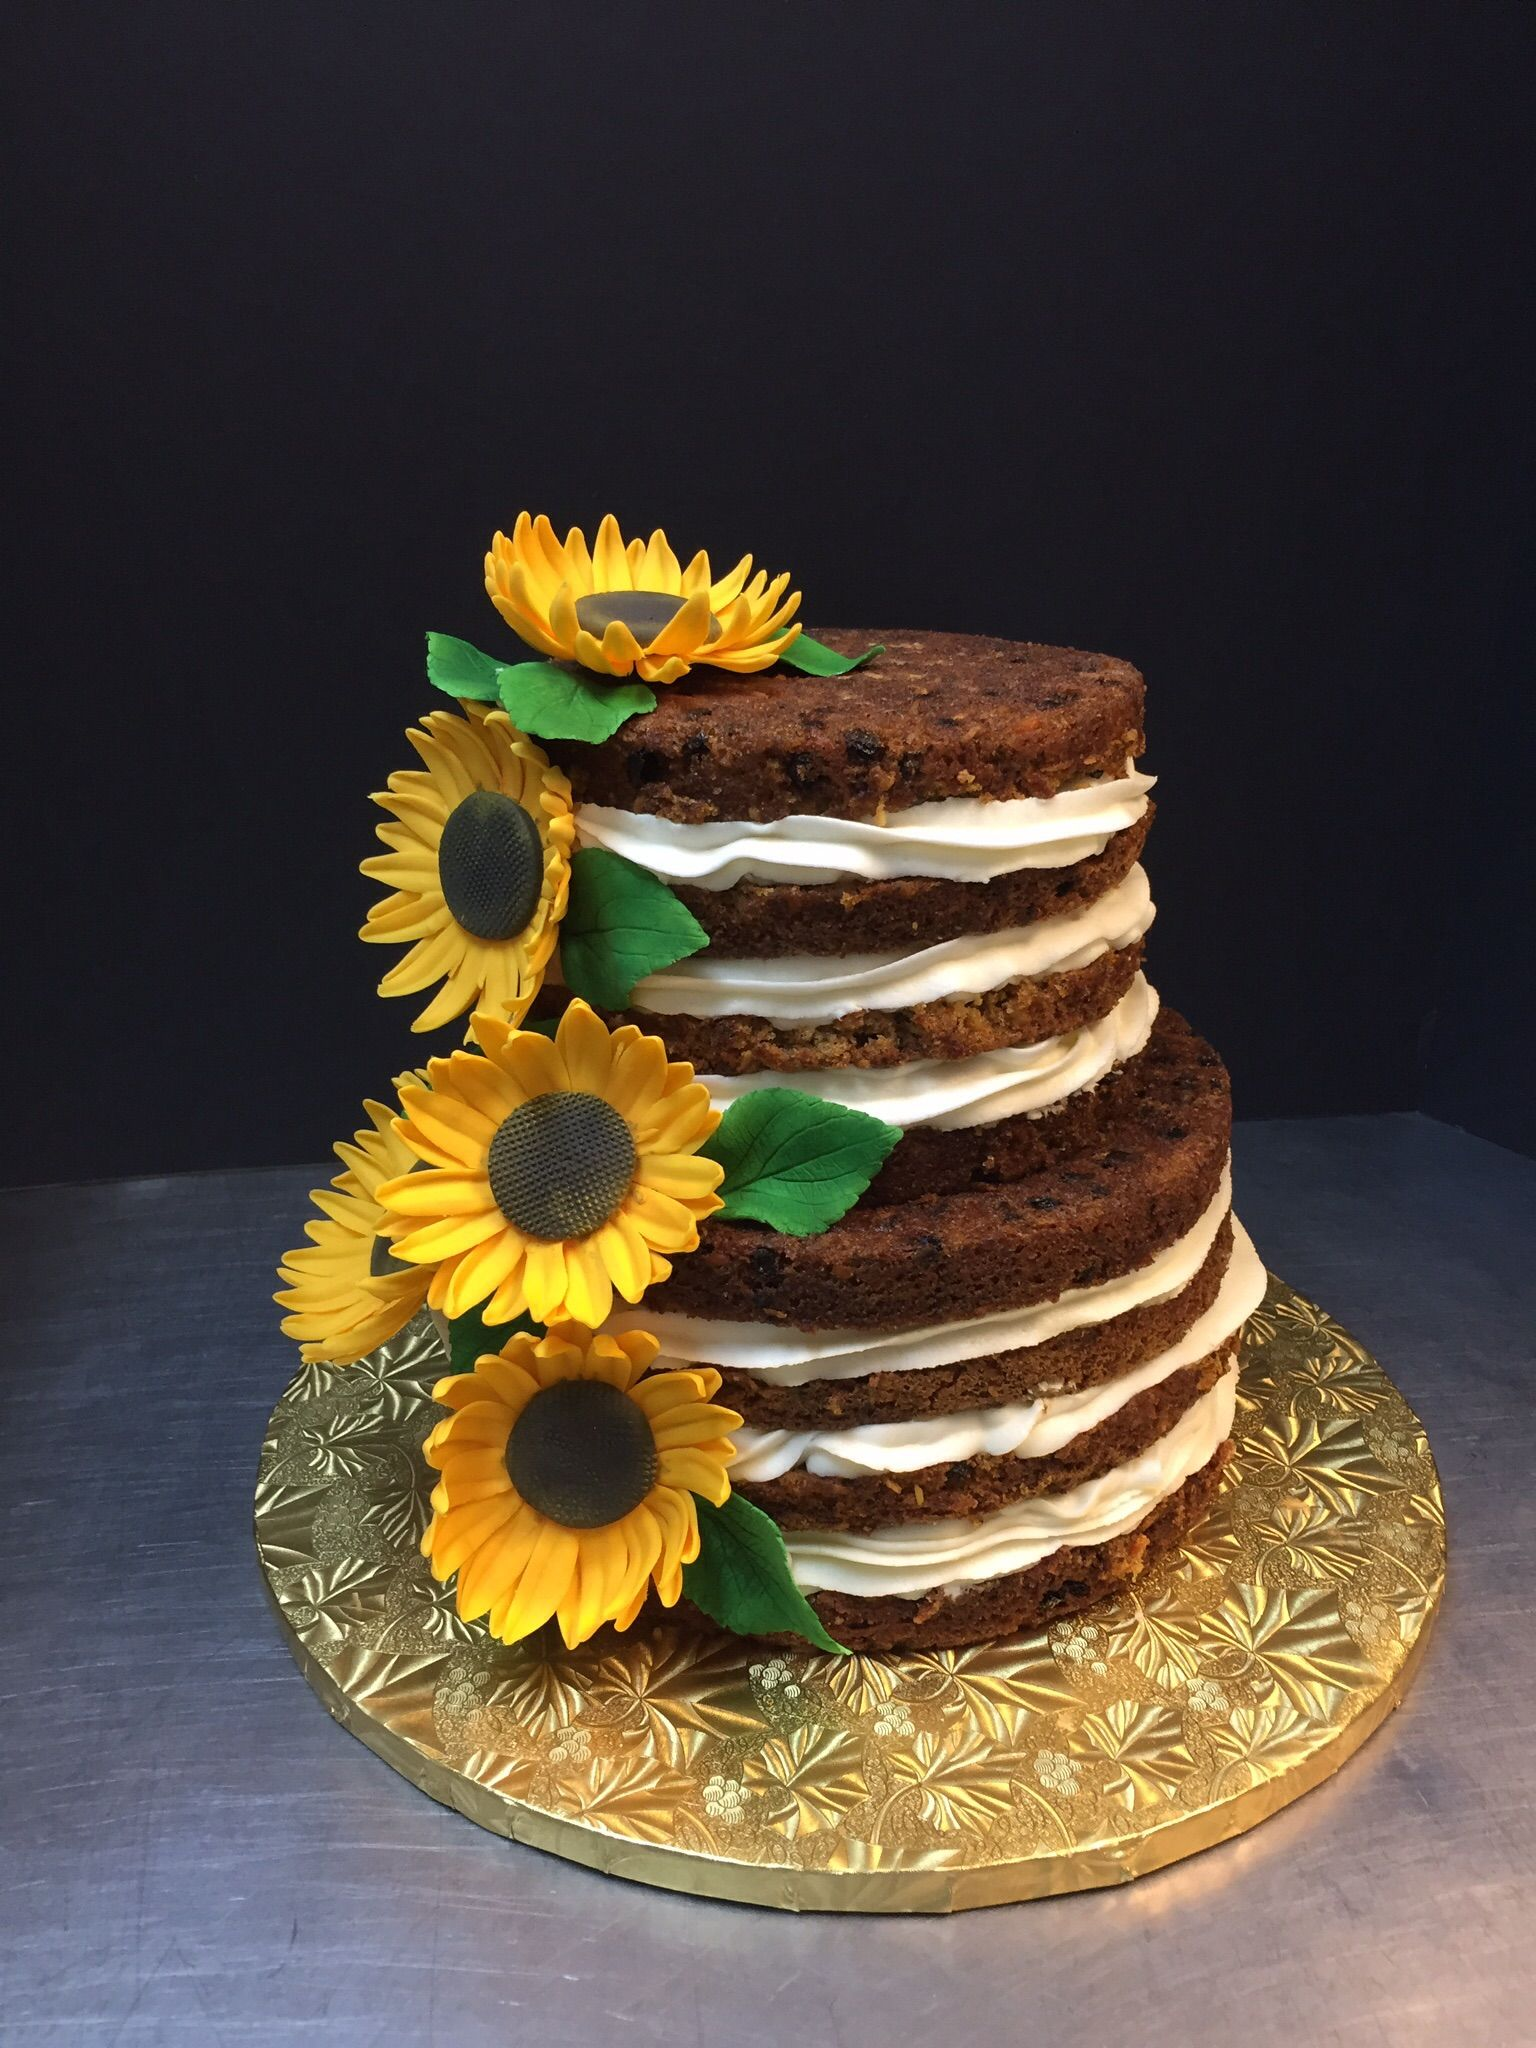 Naked Sunflower Cake  Wedding Cake Creations By -5969